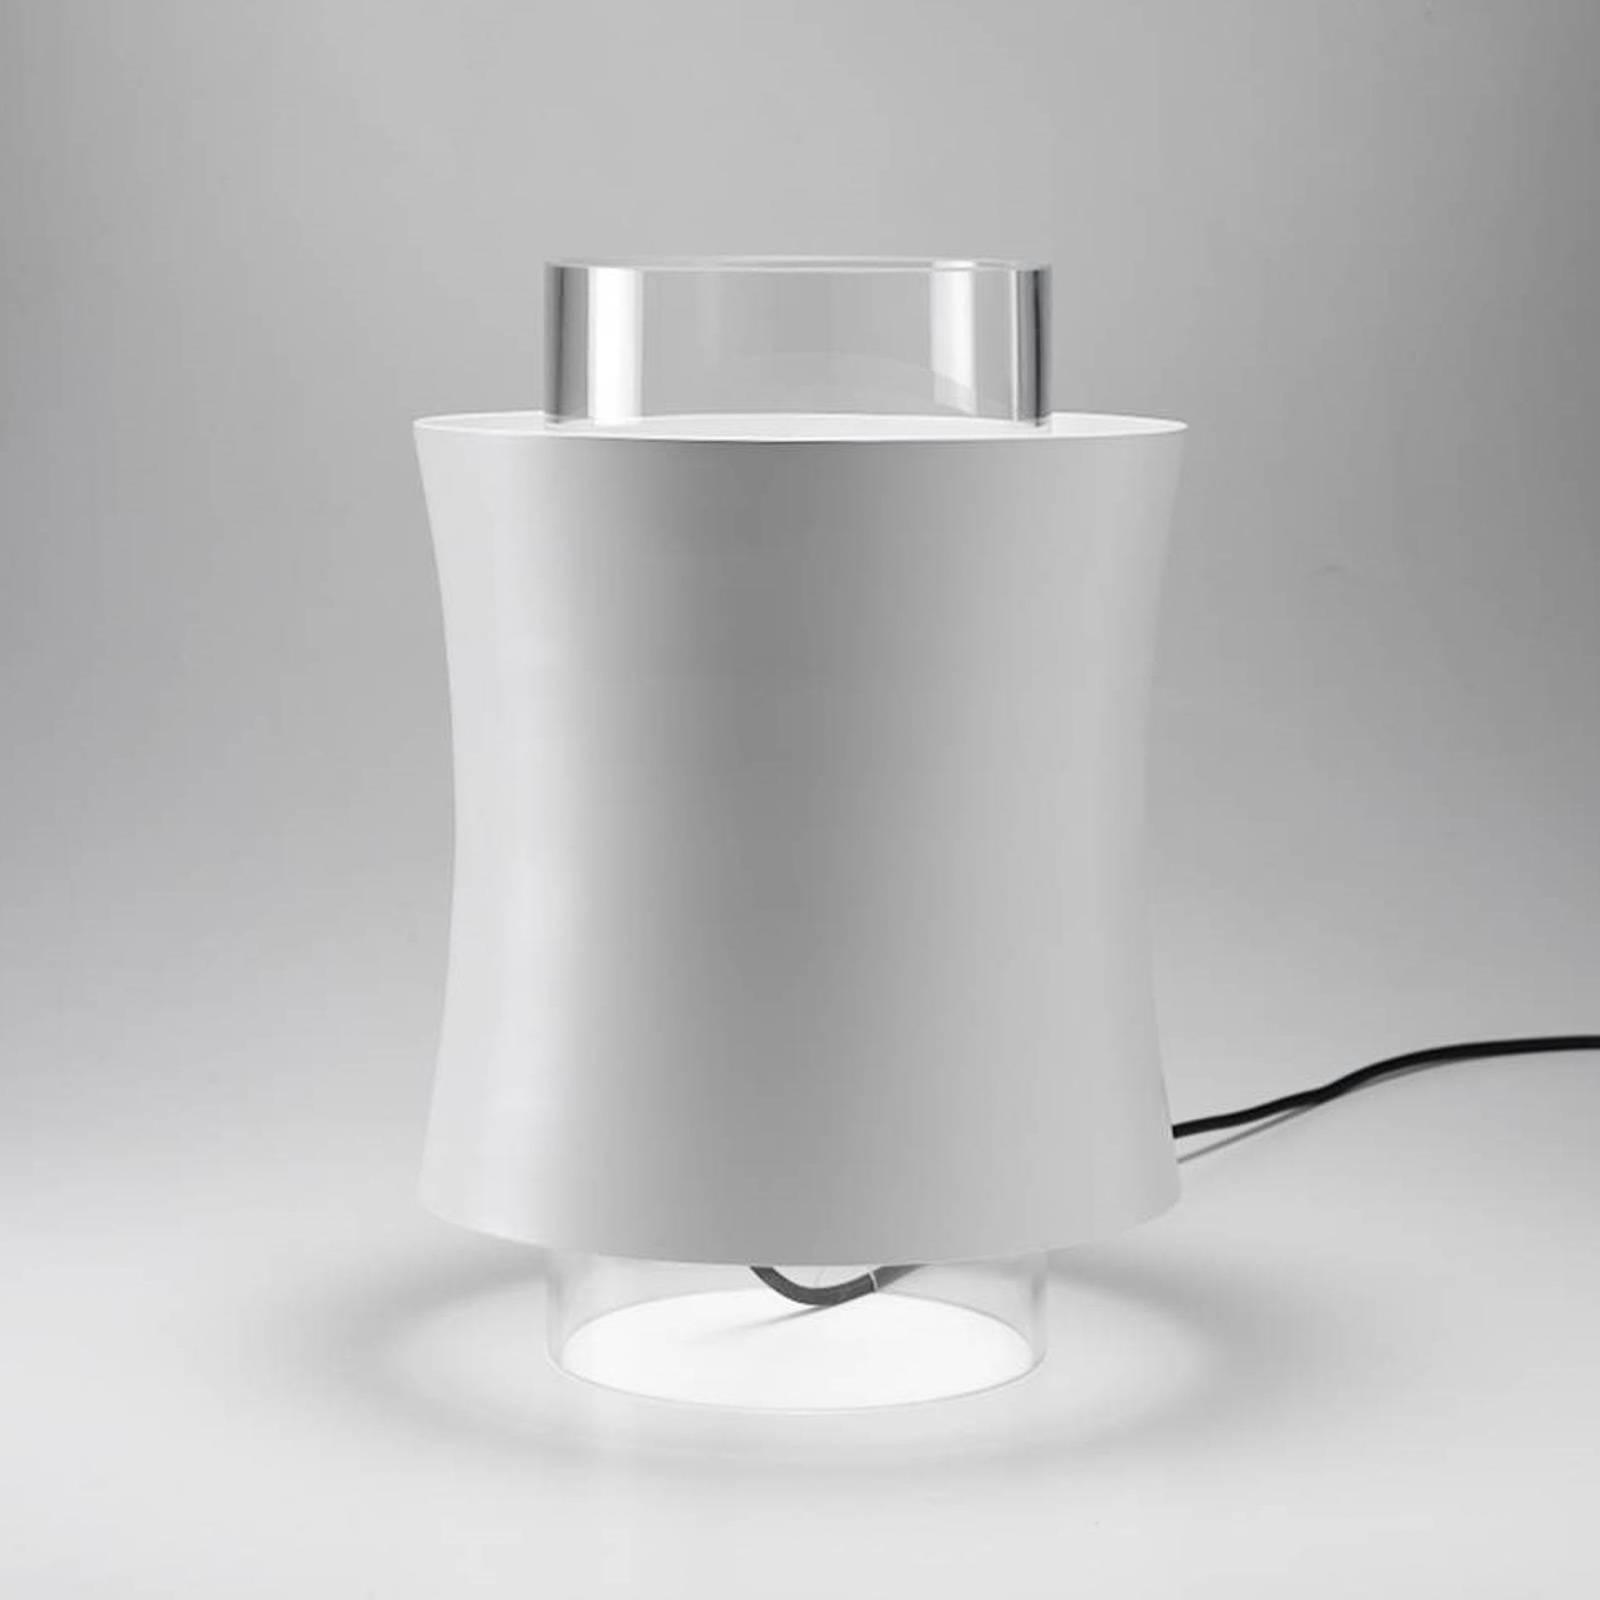 Prandina Fez T1 lampe à poser sable mat